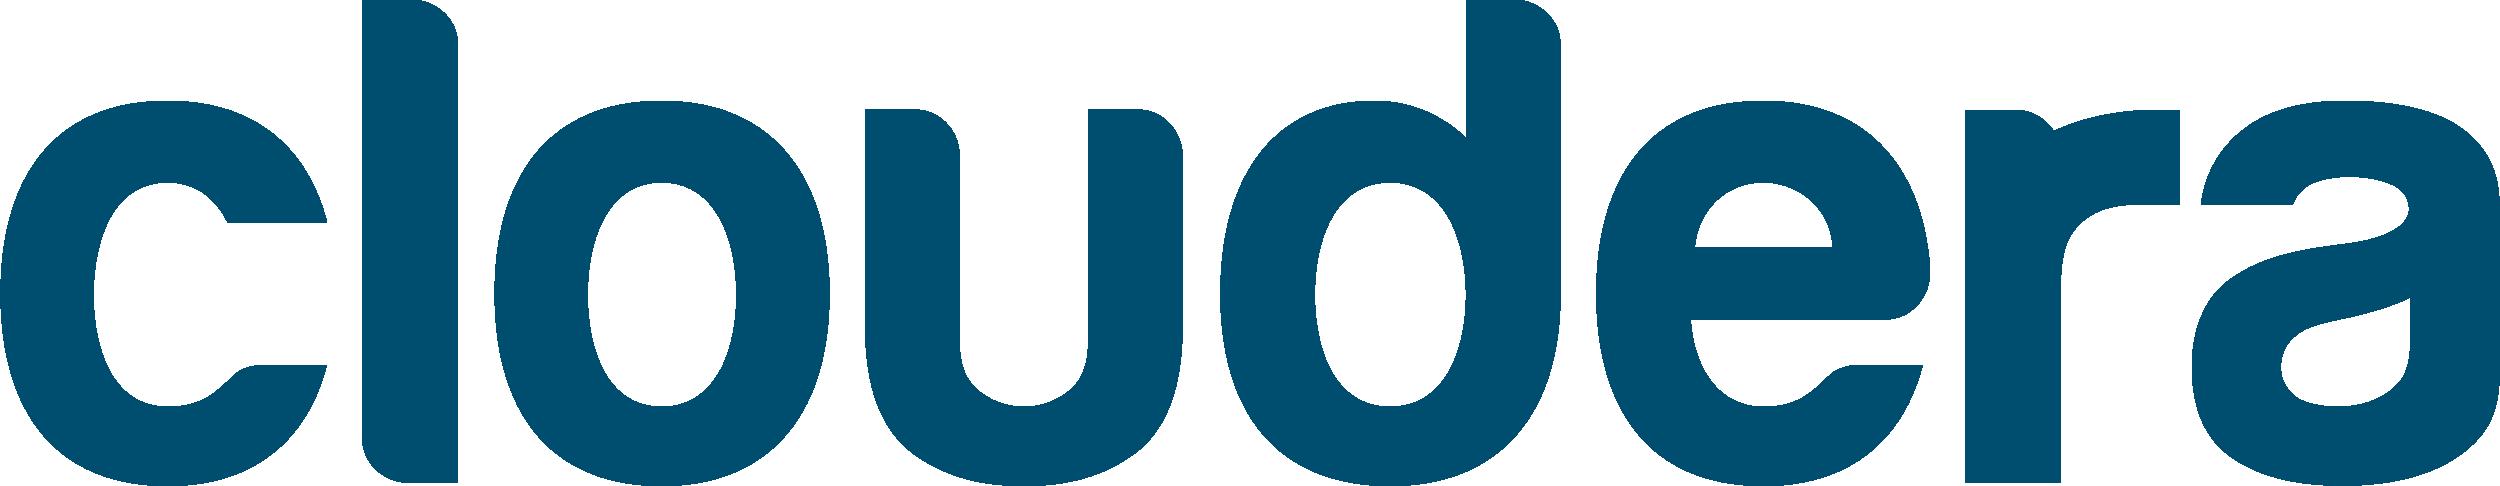 Cloudera_logo